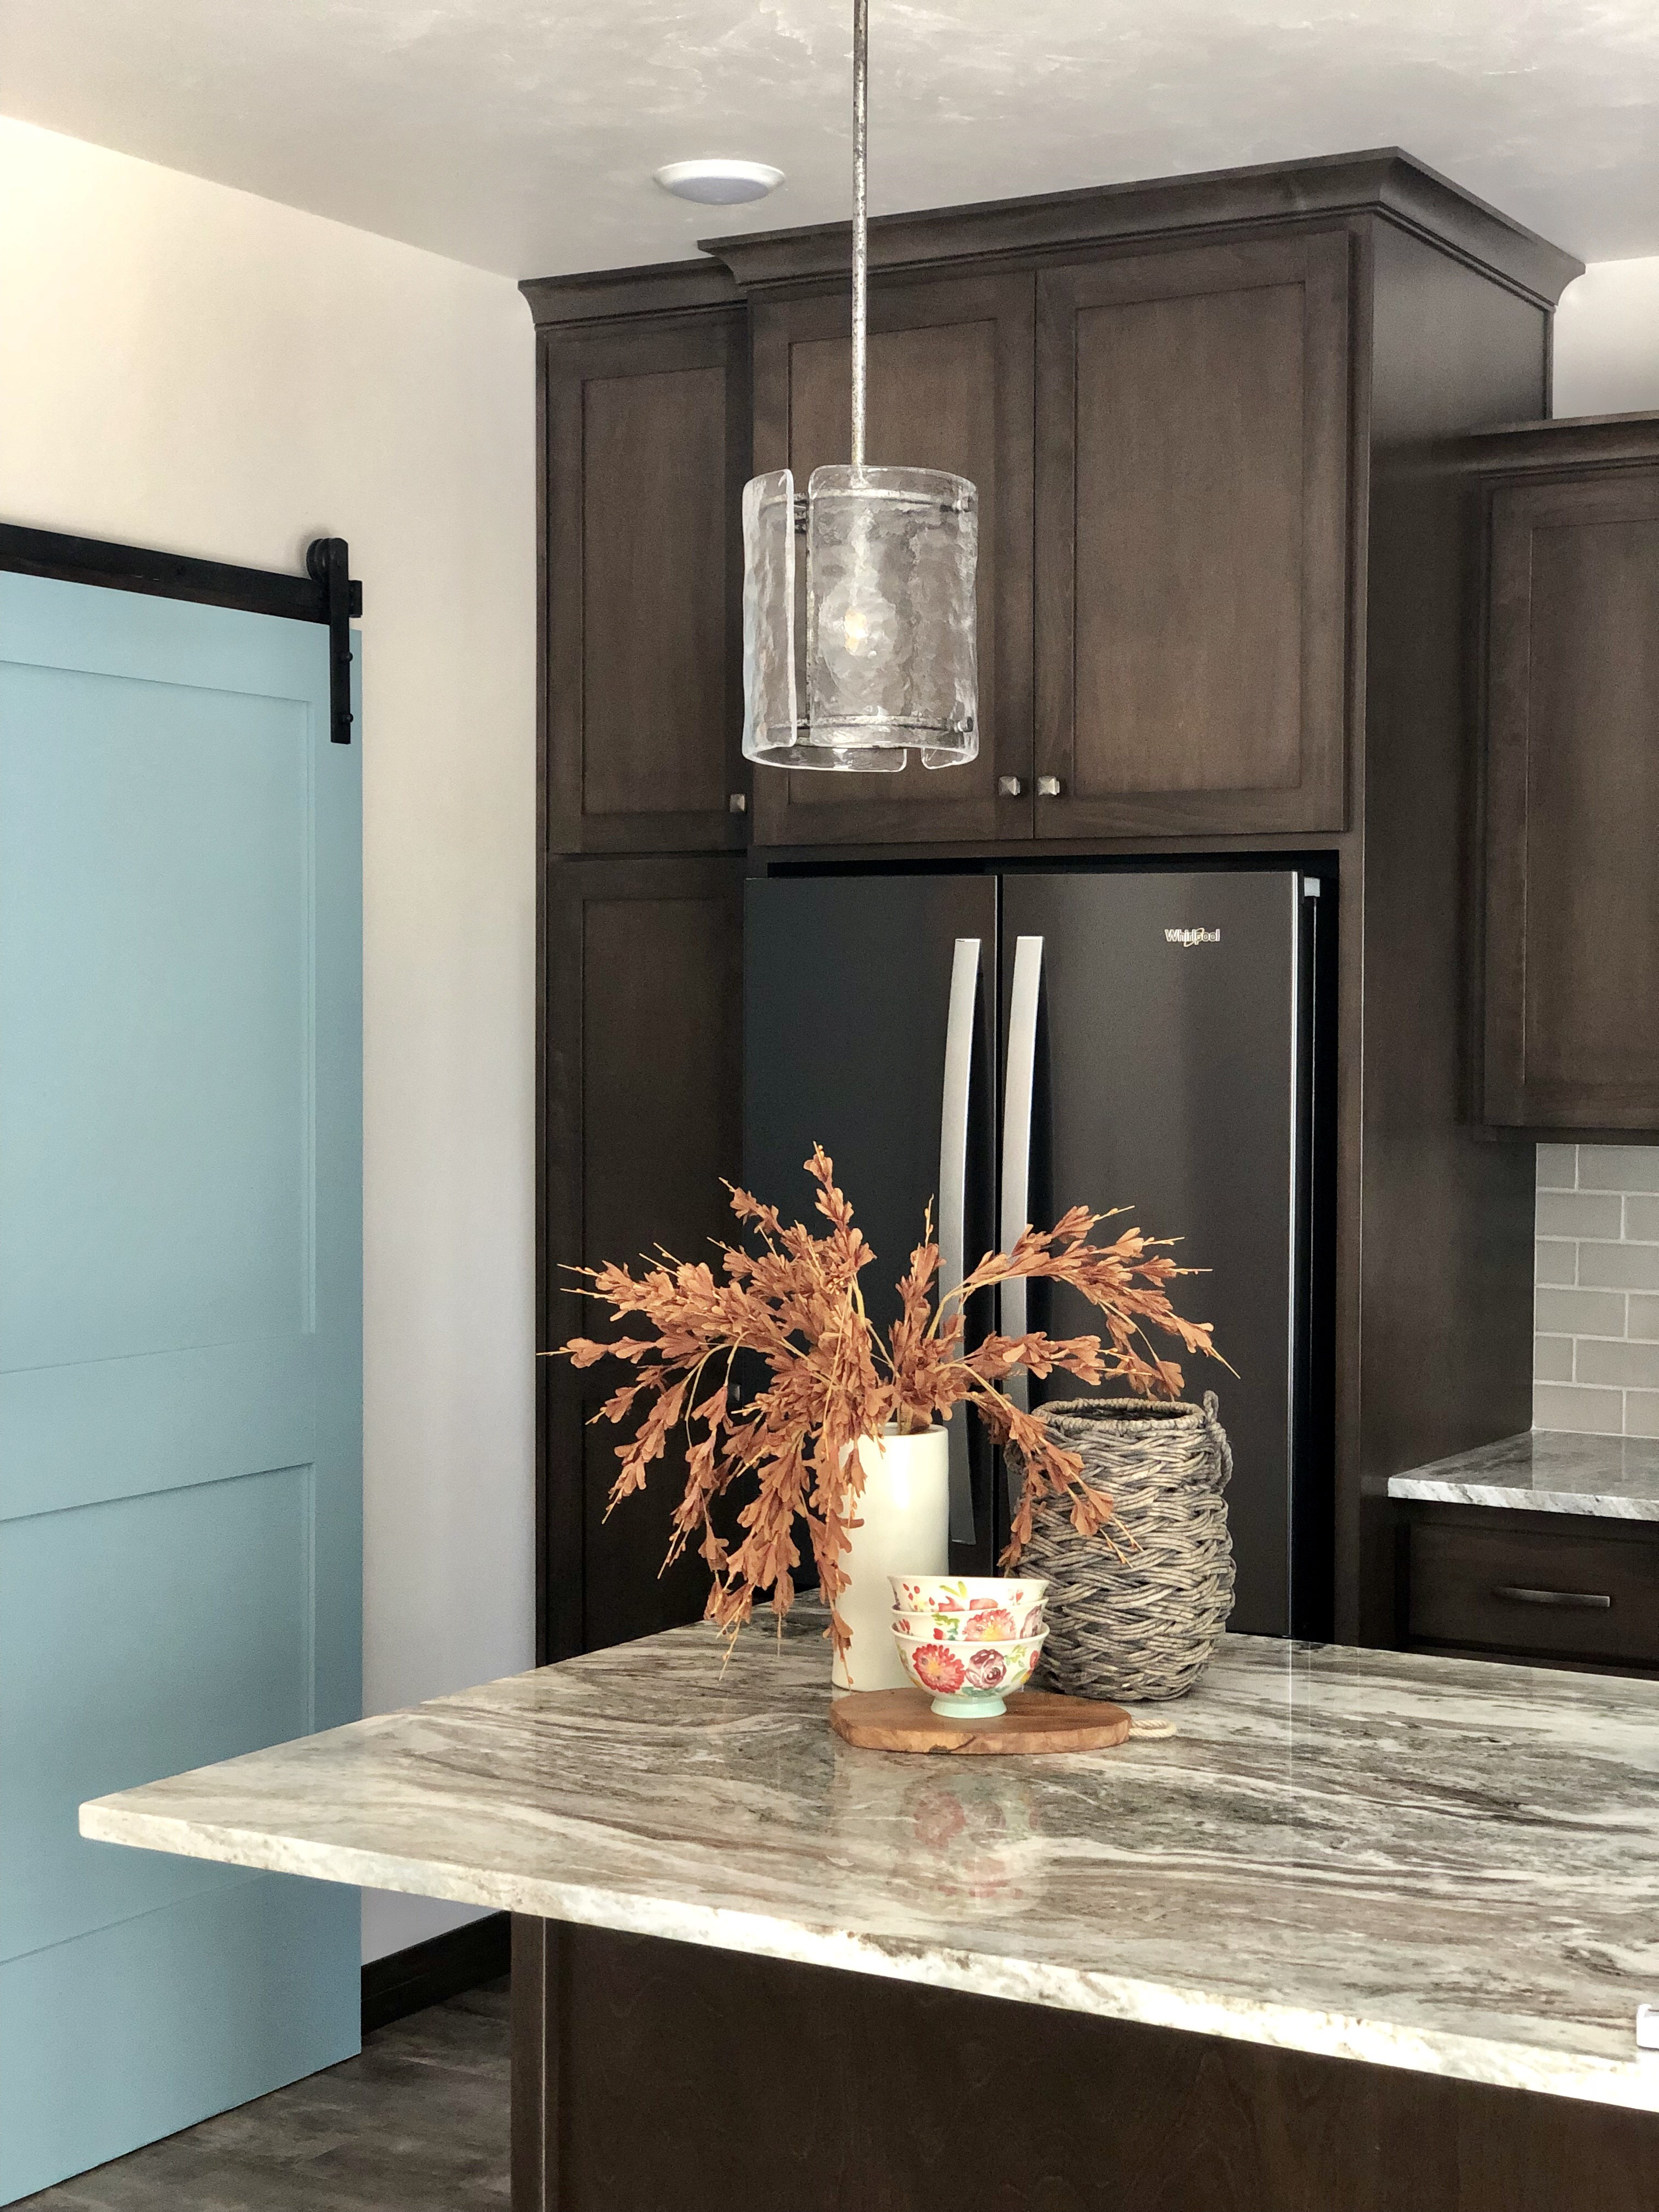 fantasy brown marble kitchen image